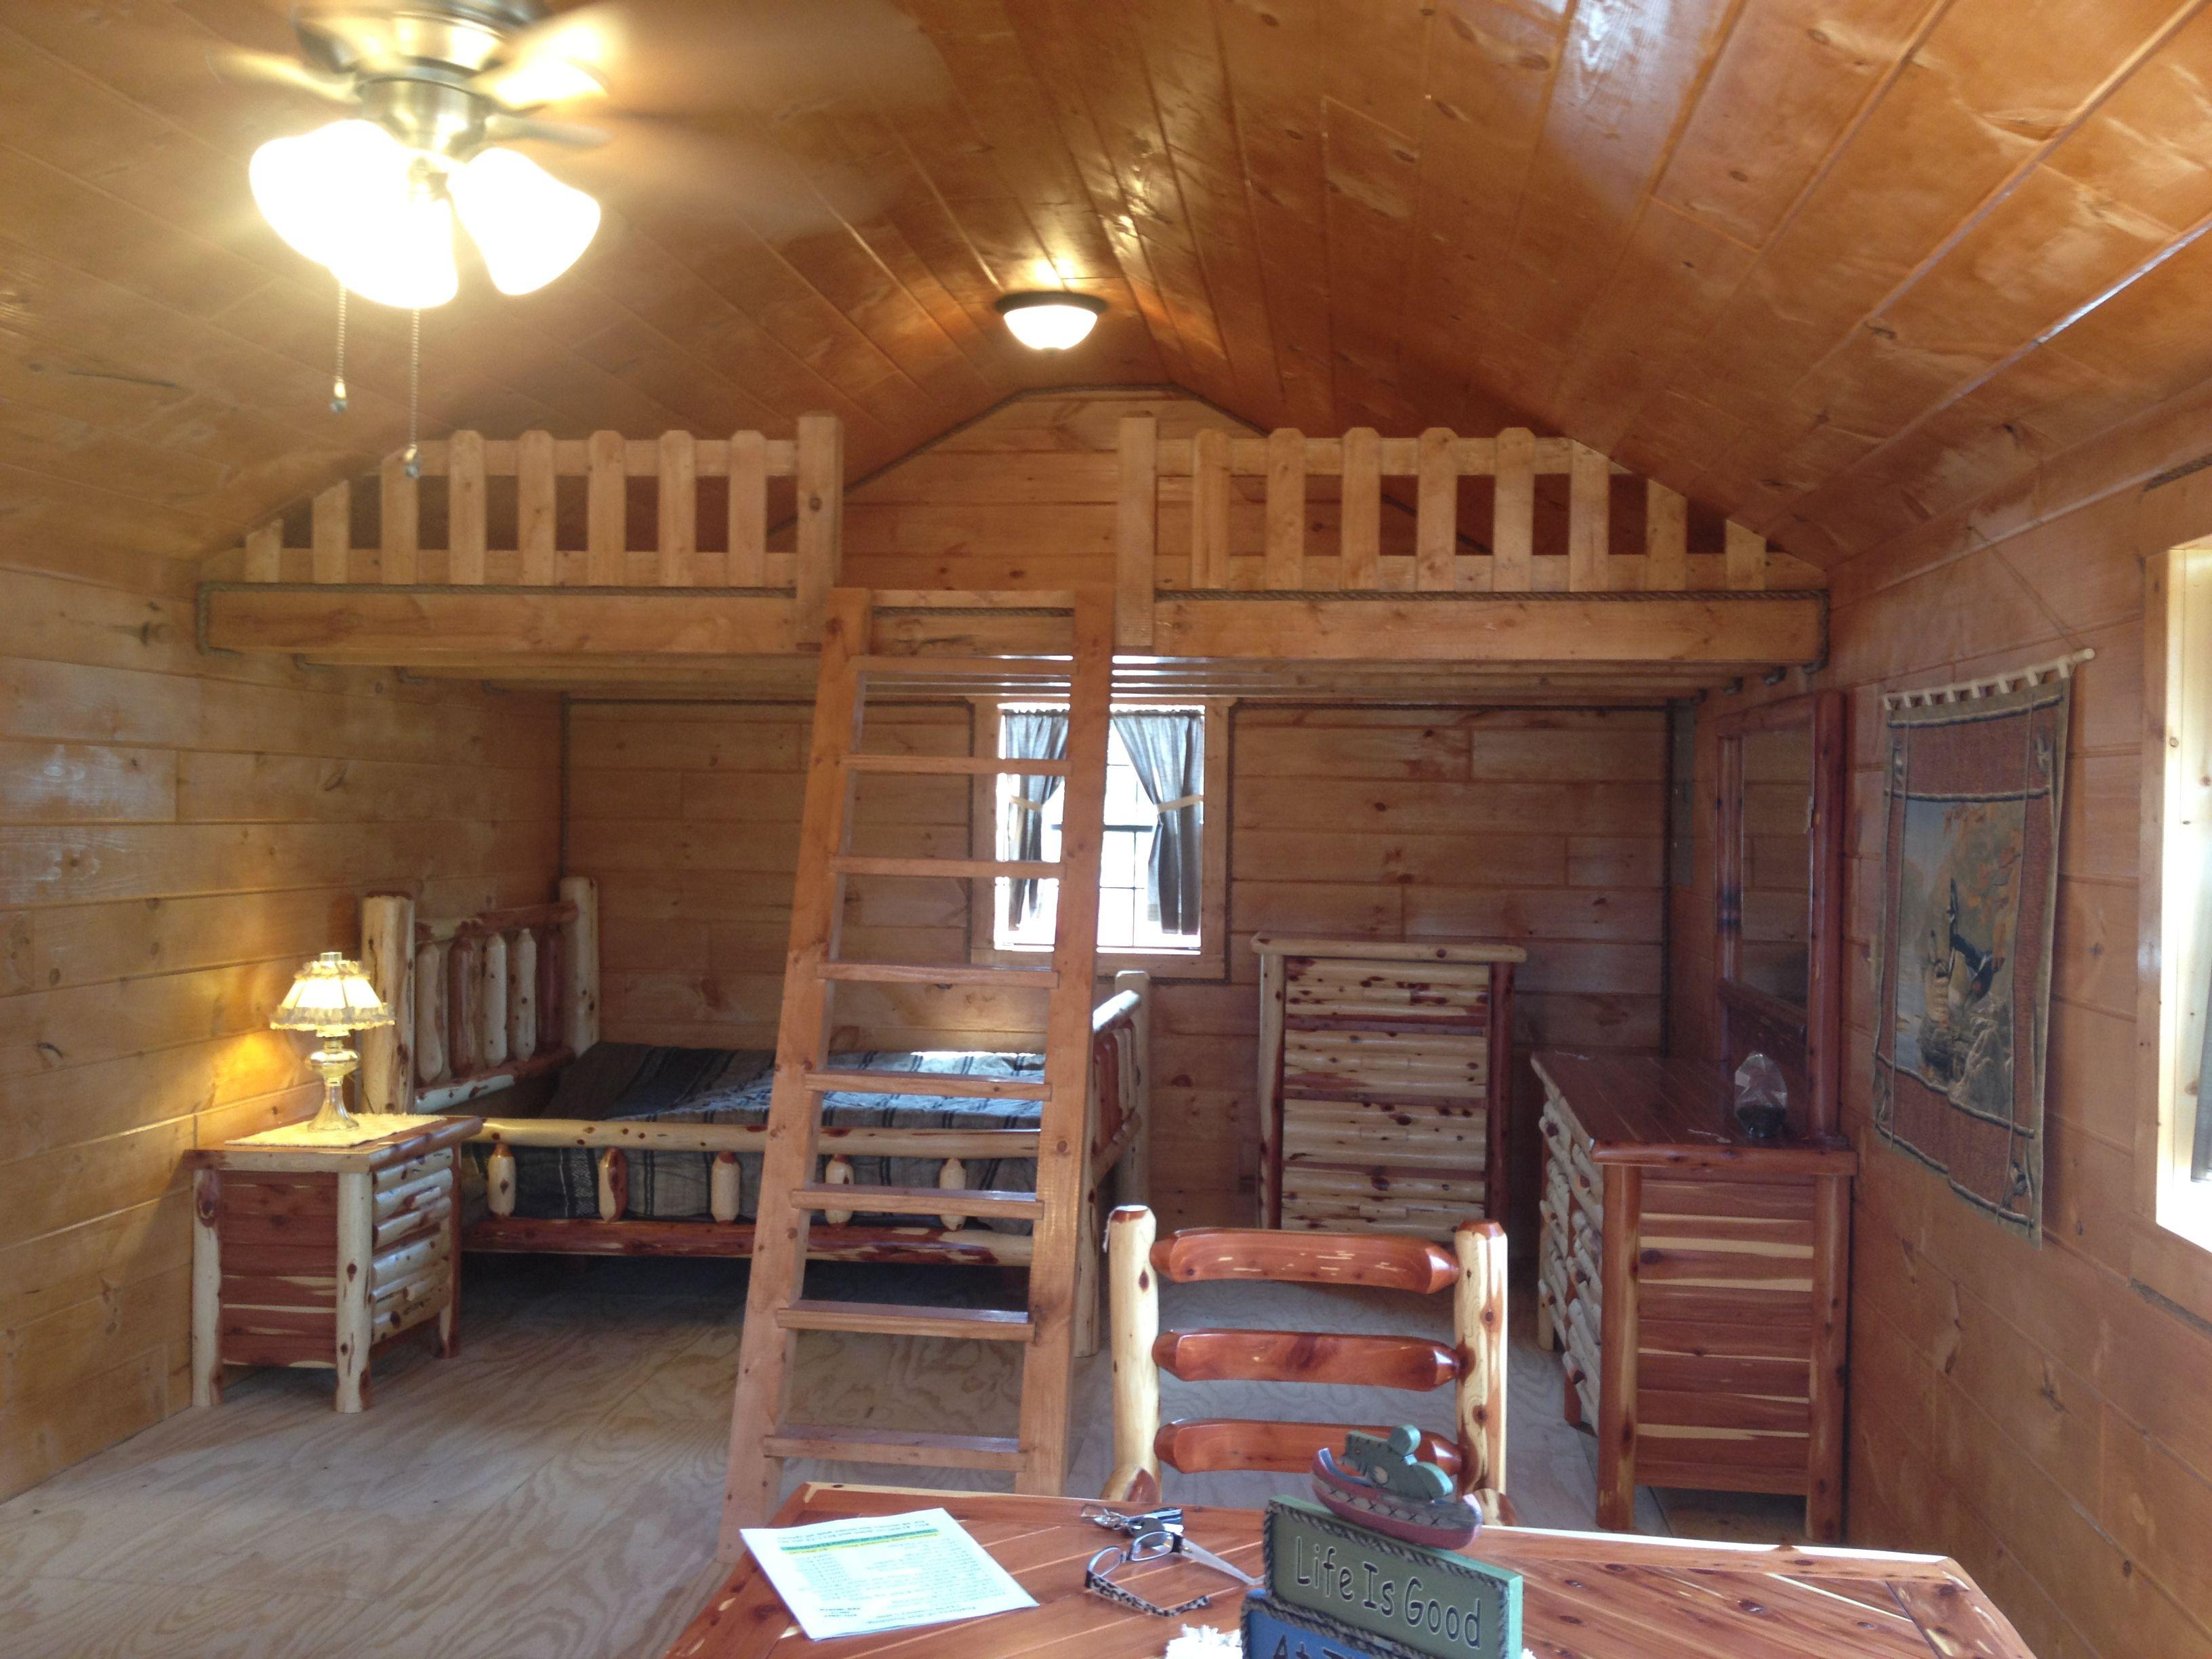 Merveilleux Cabins Built By Mennonite. Cumberland Furnace, TN.